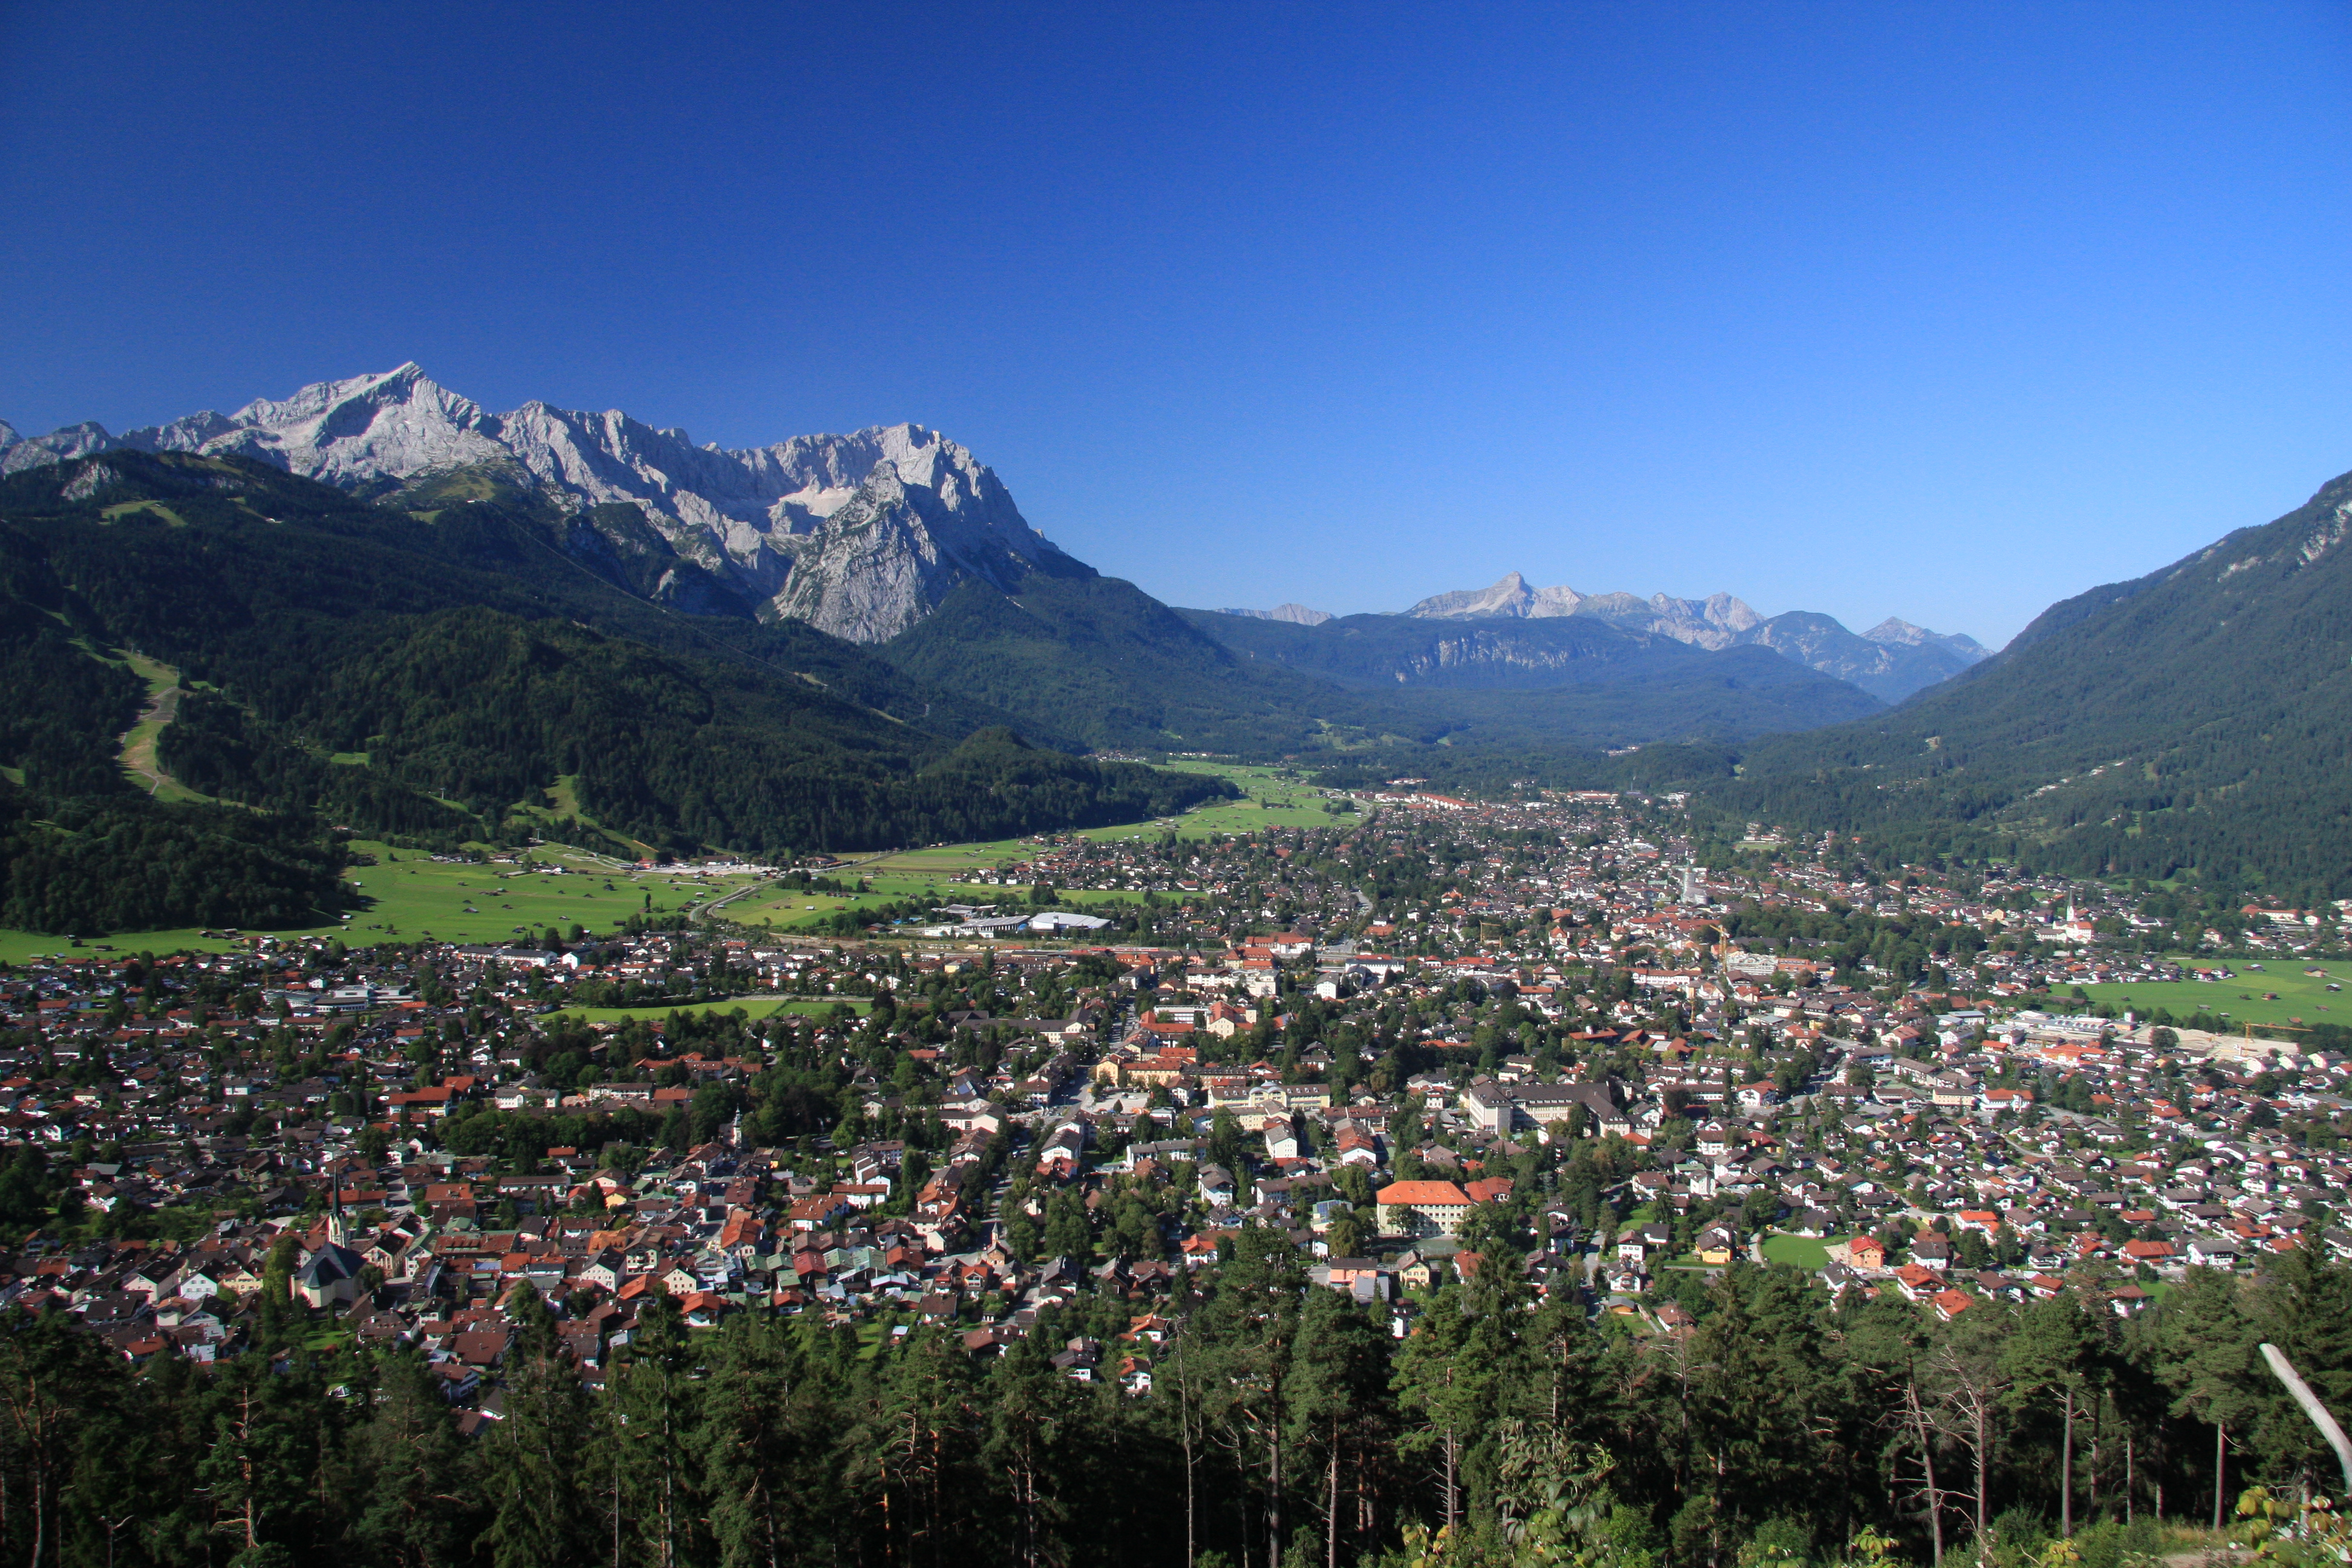 Patenkirchen